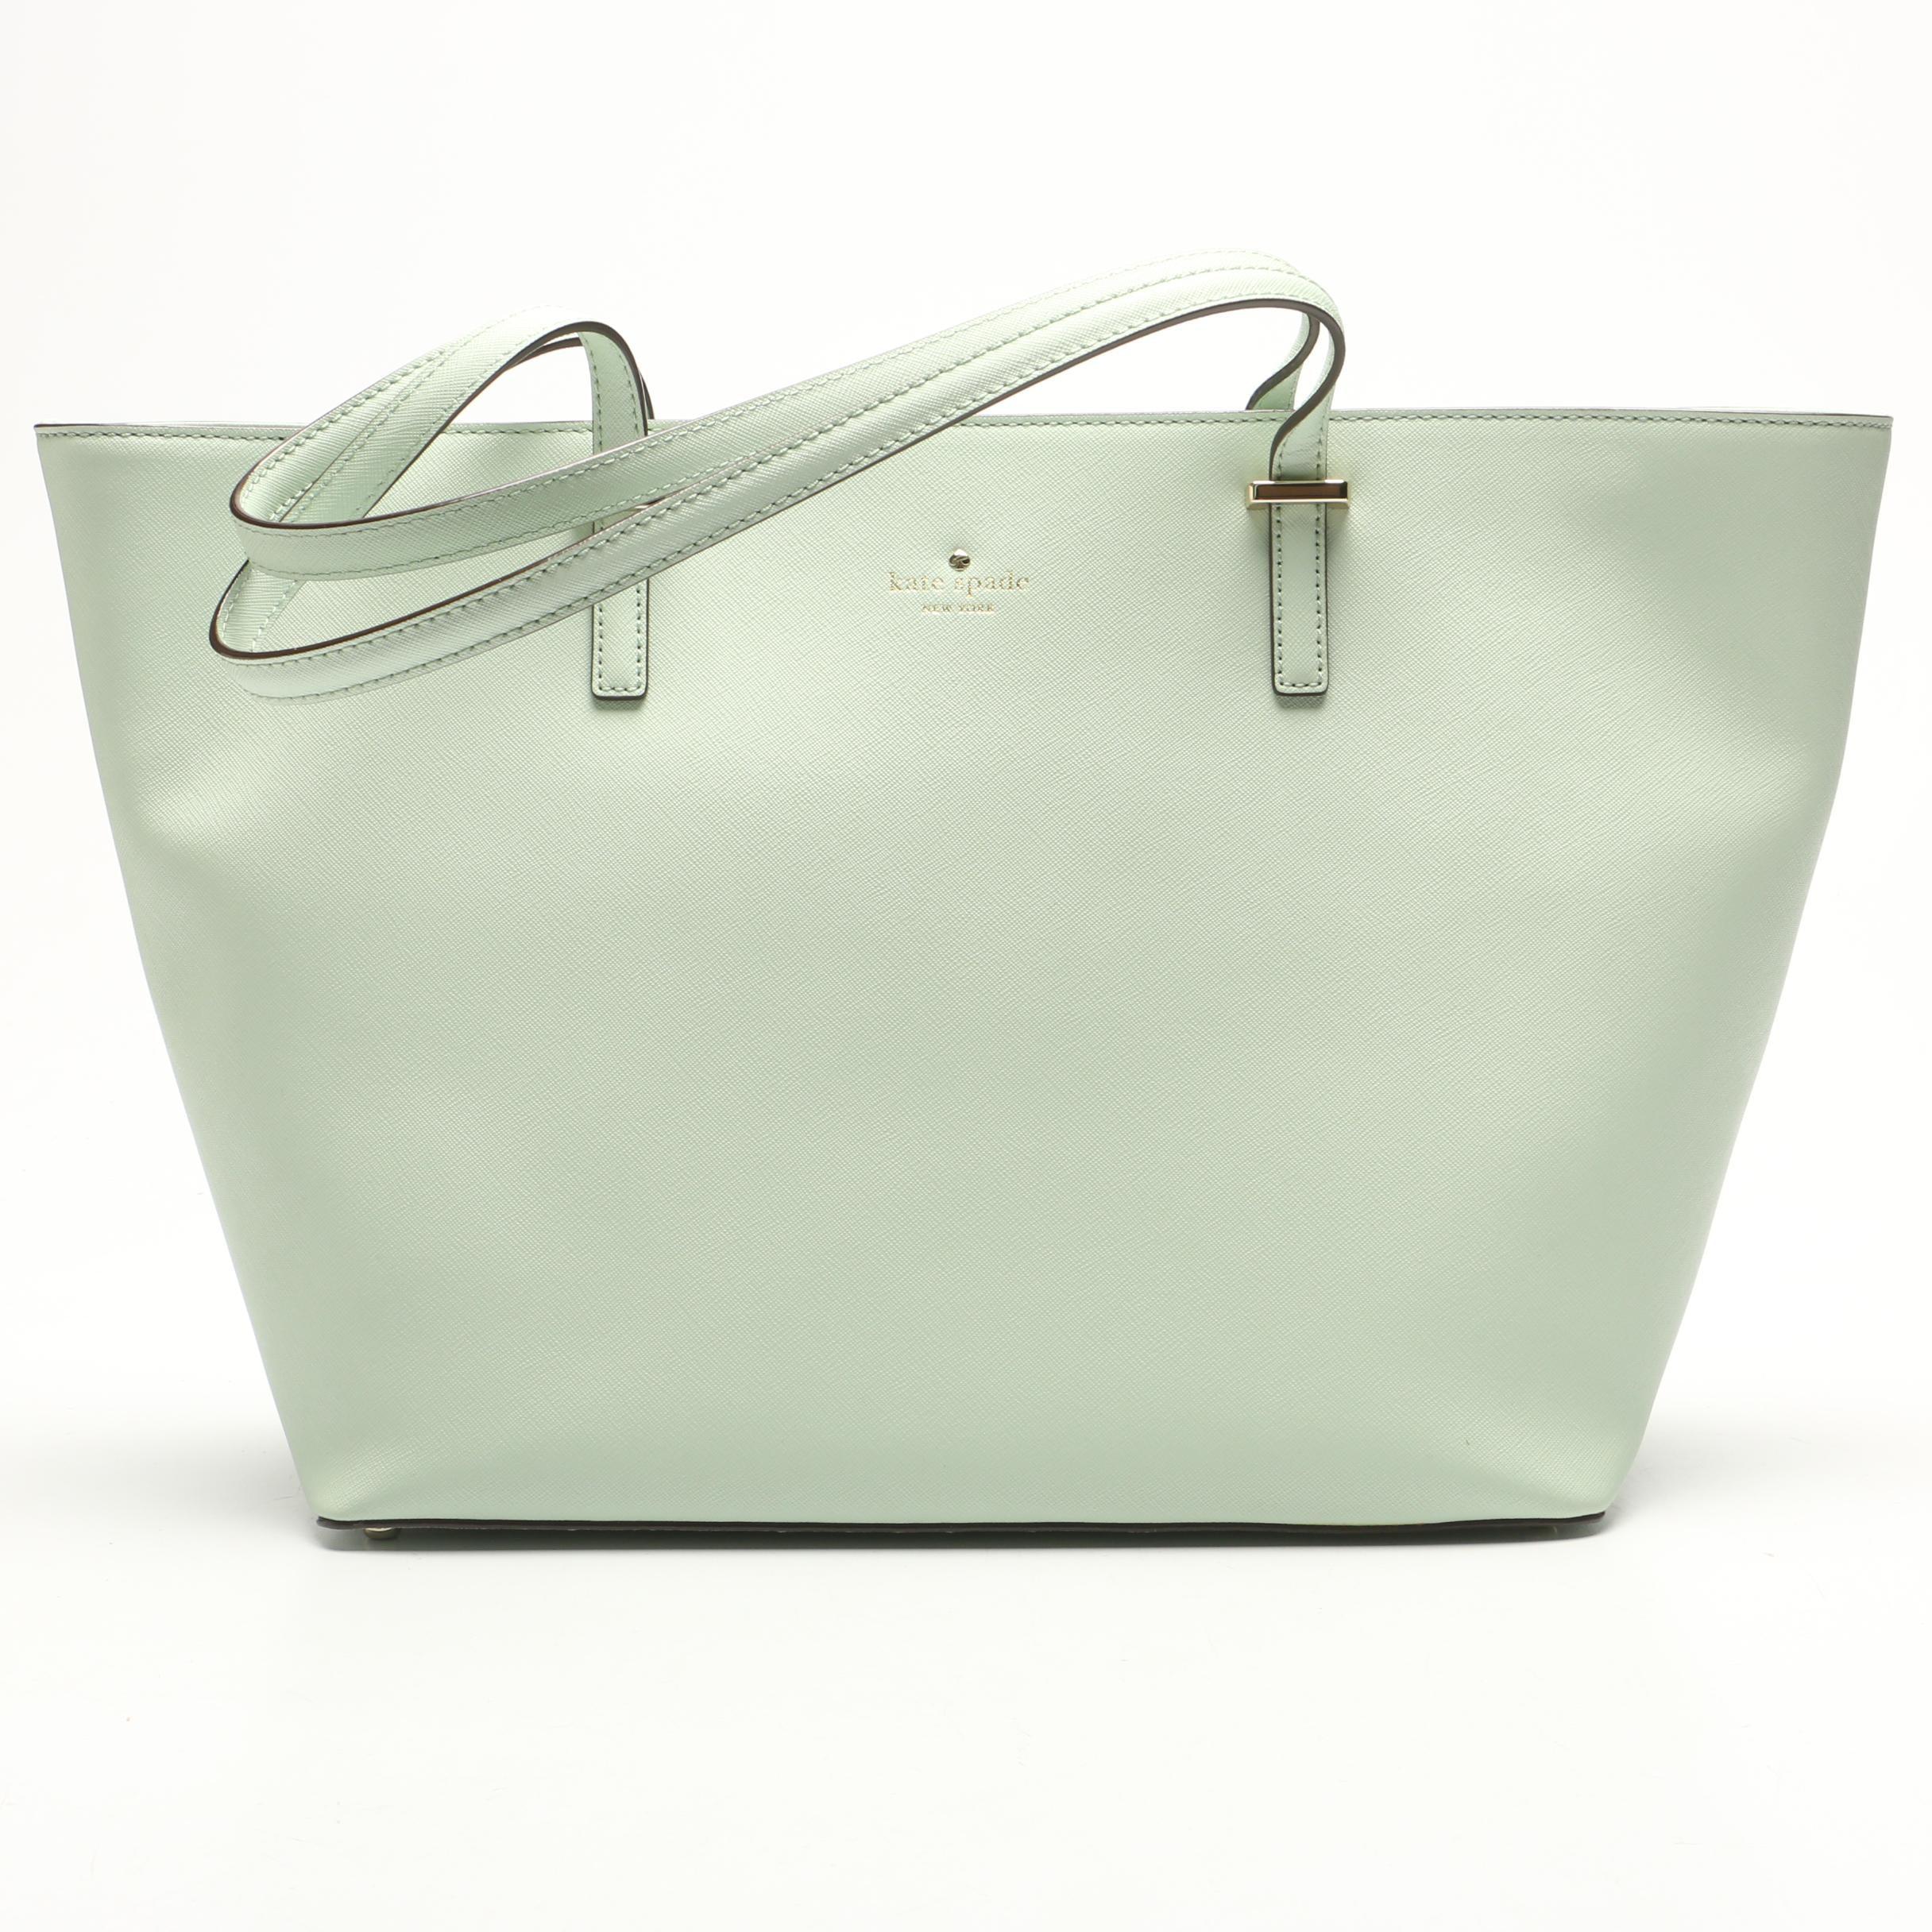 Kate Spade New York Medium Harmony Cedar Street Tote Bag in Mint Mojito